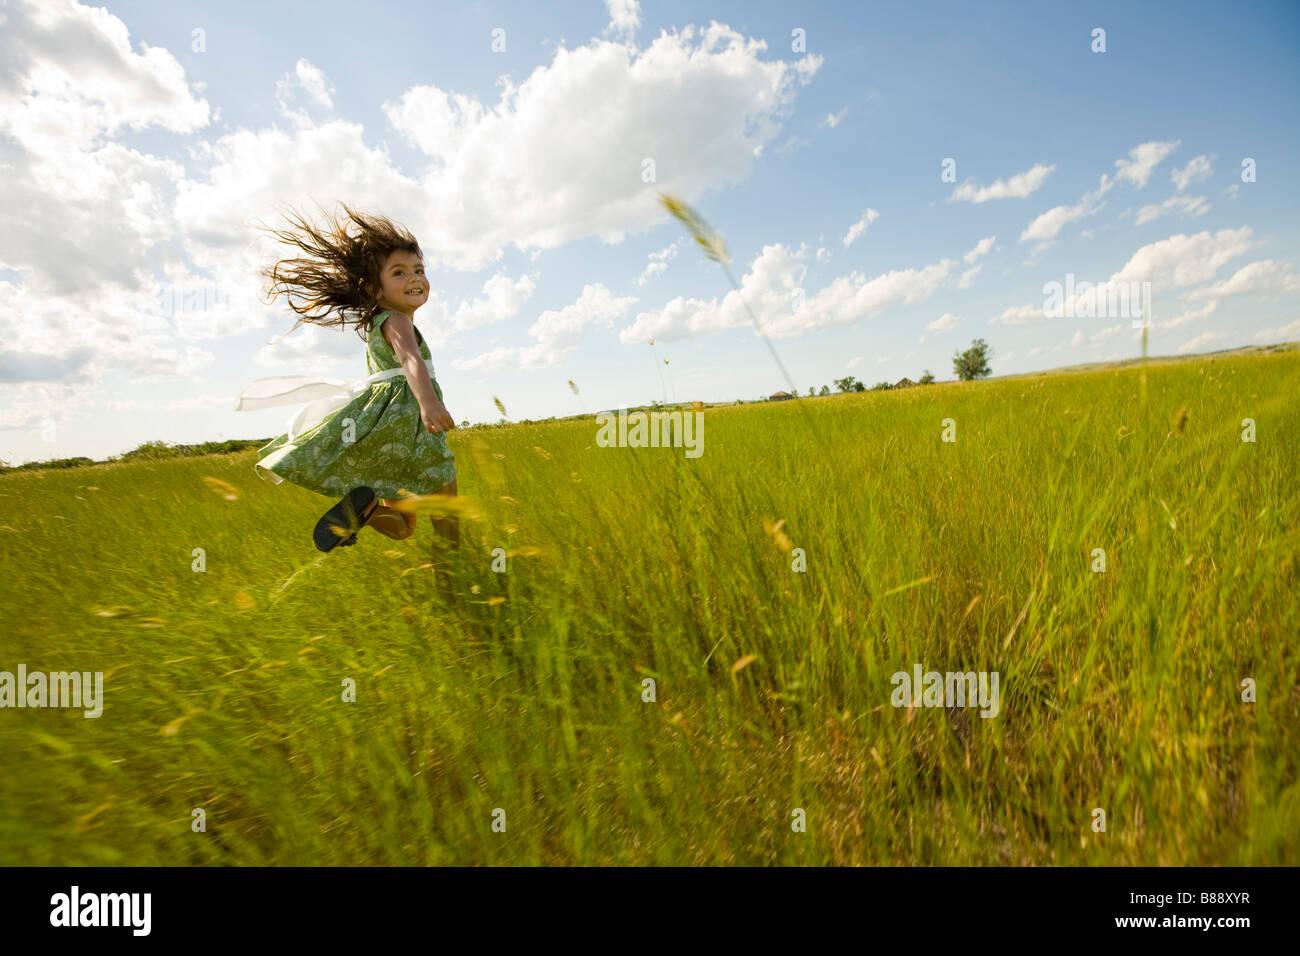 Girl Running Through A Grassy Field In North Dakota Stock